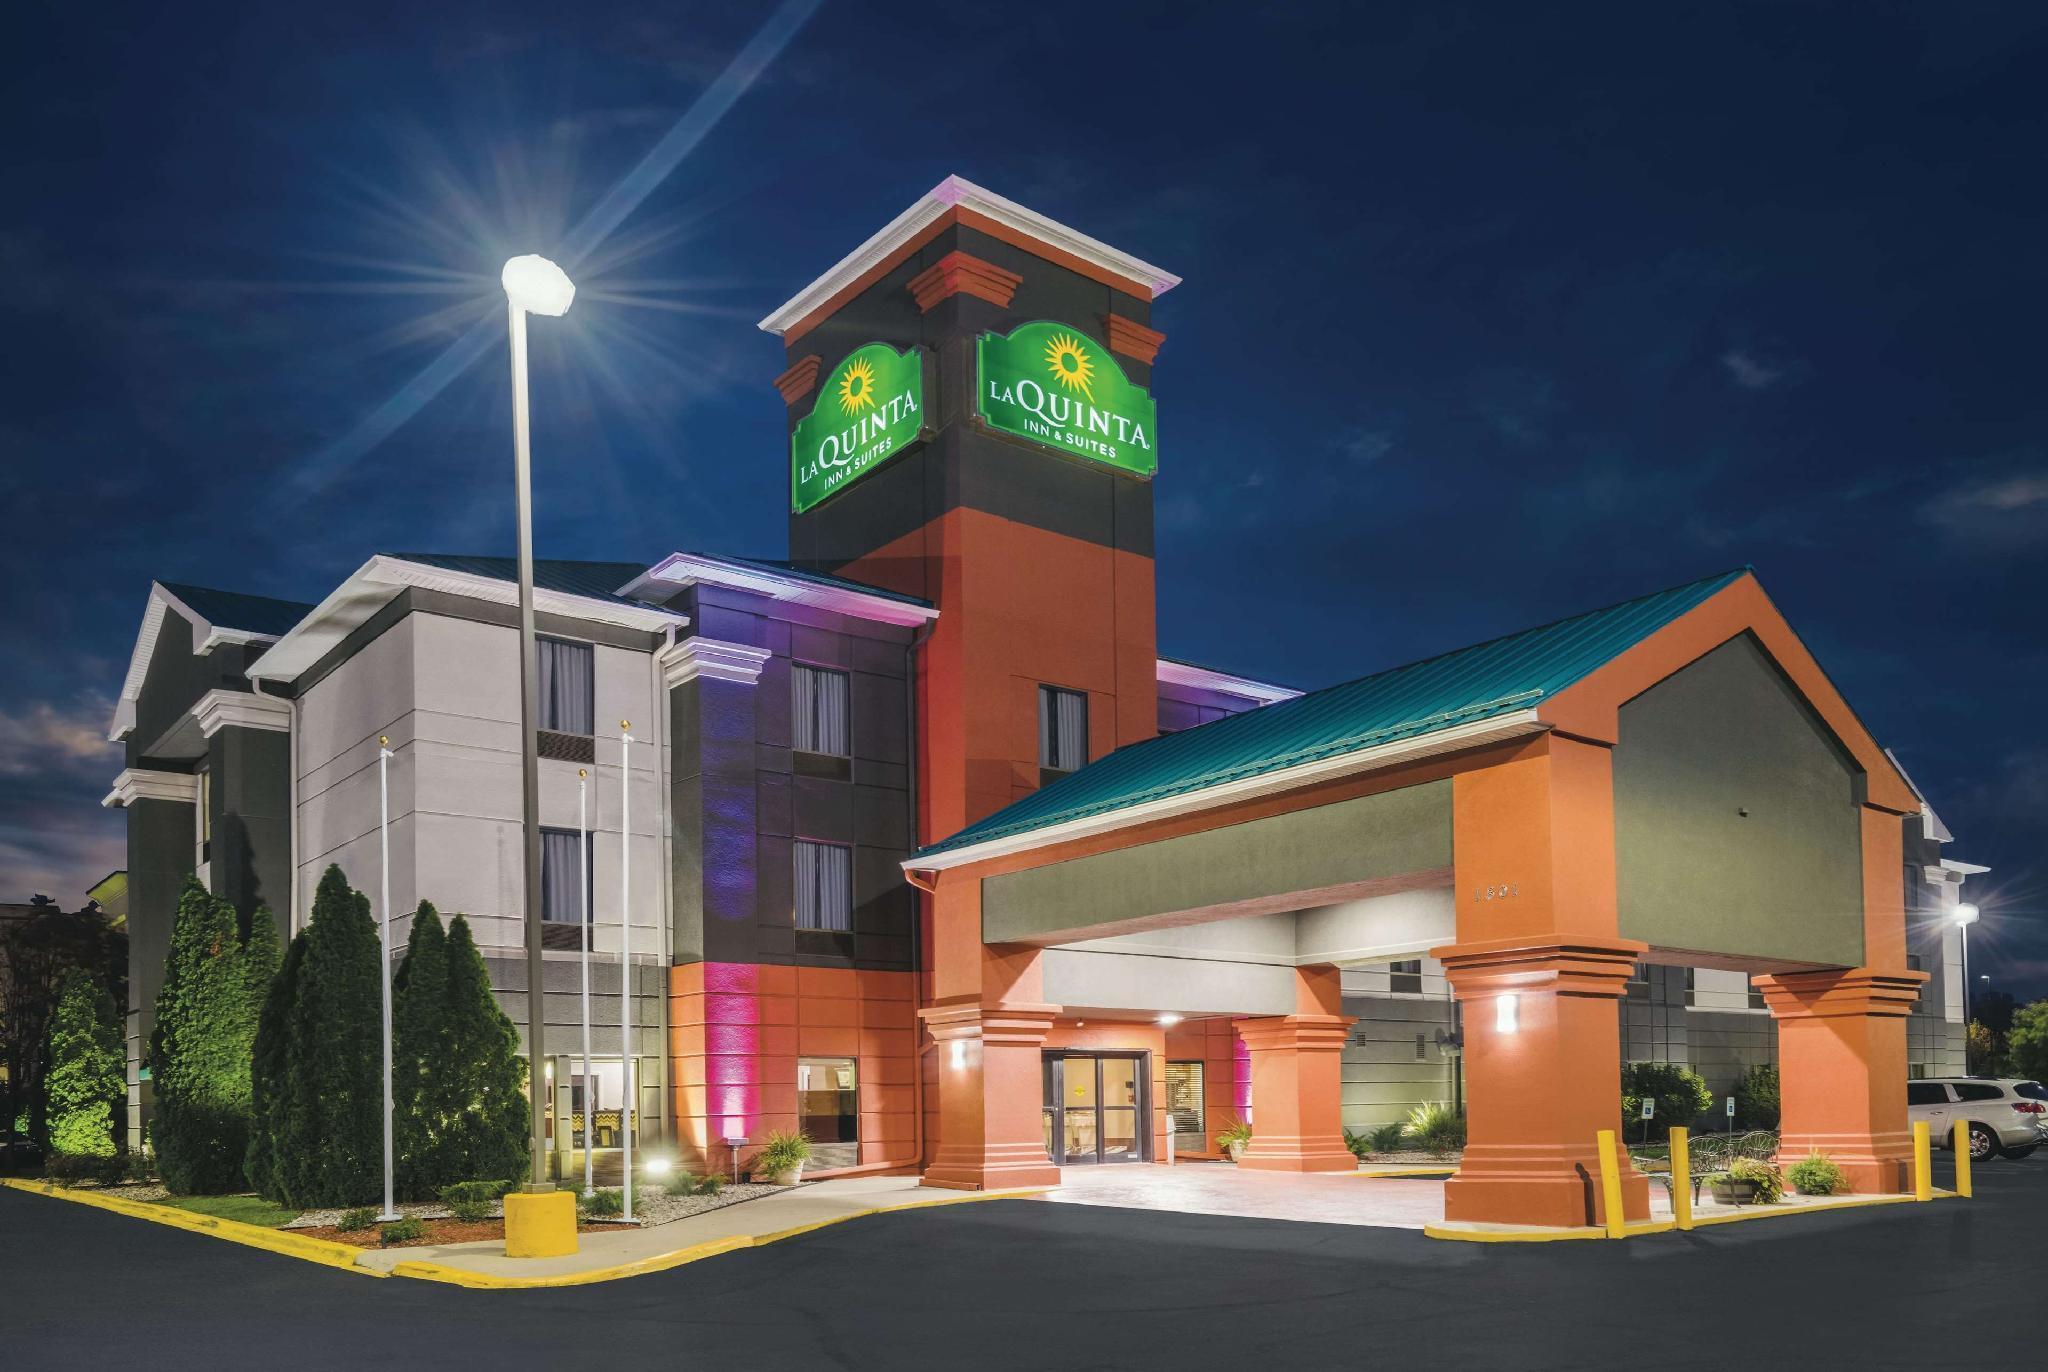 La Quinta Inn And Suites By Wyndham Louisville